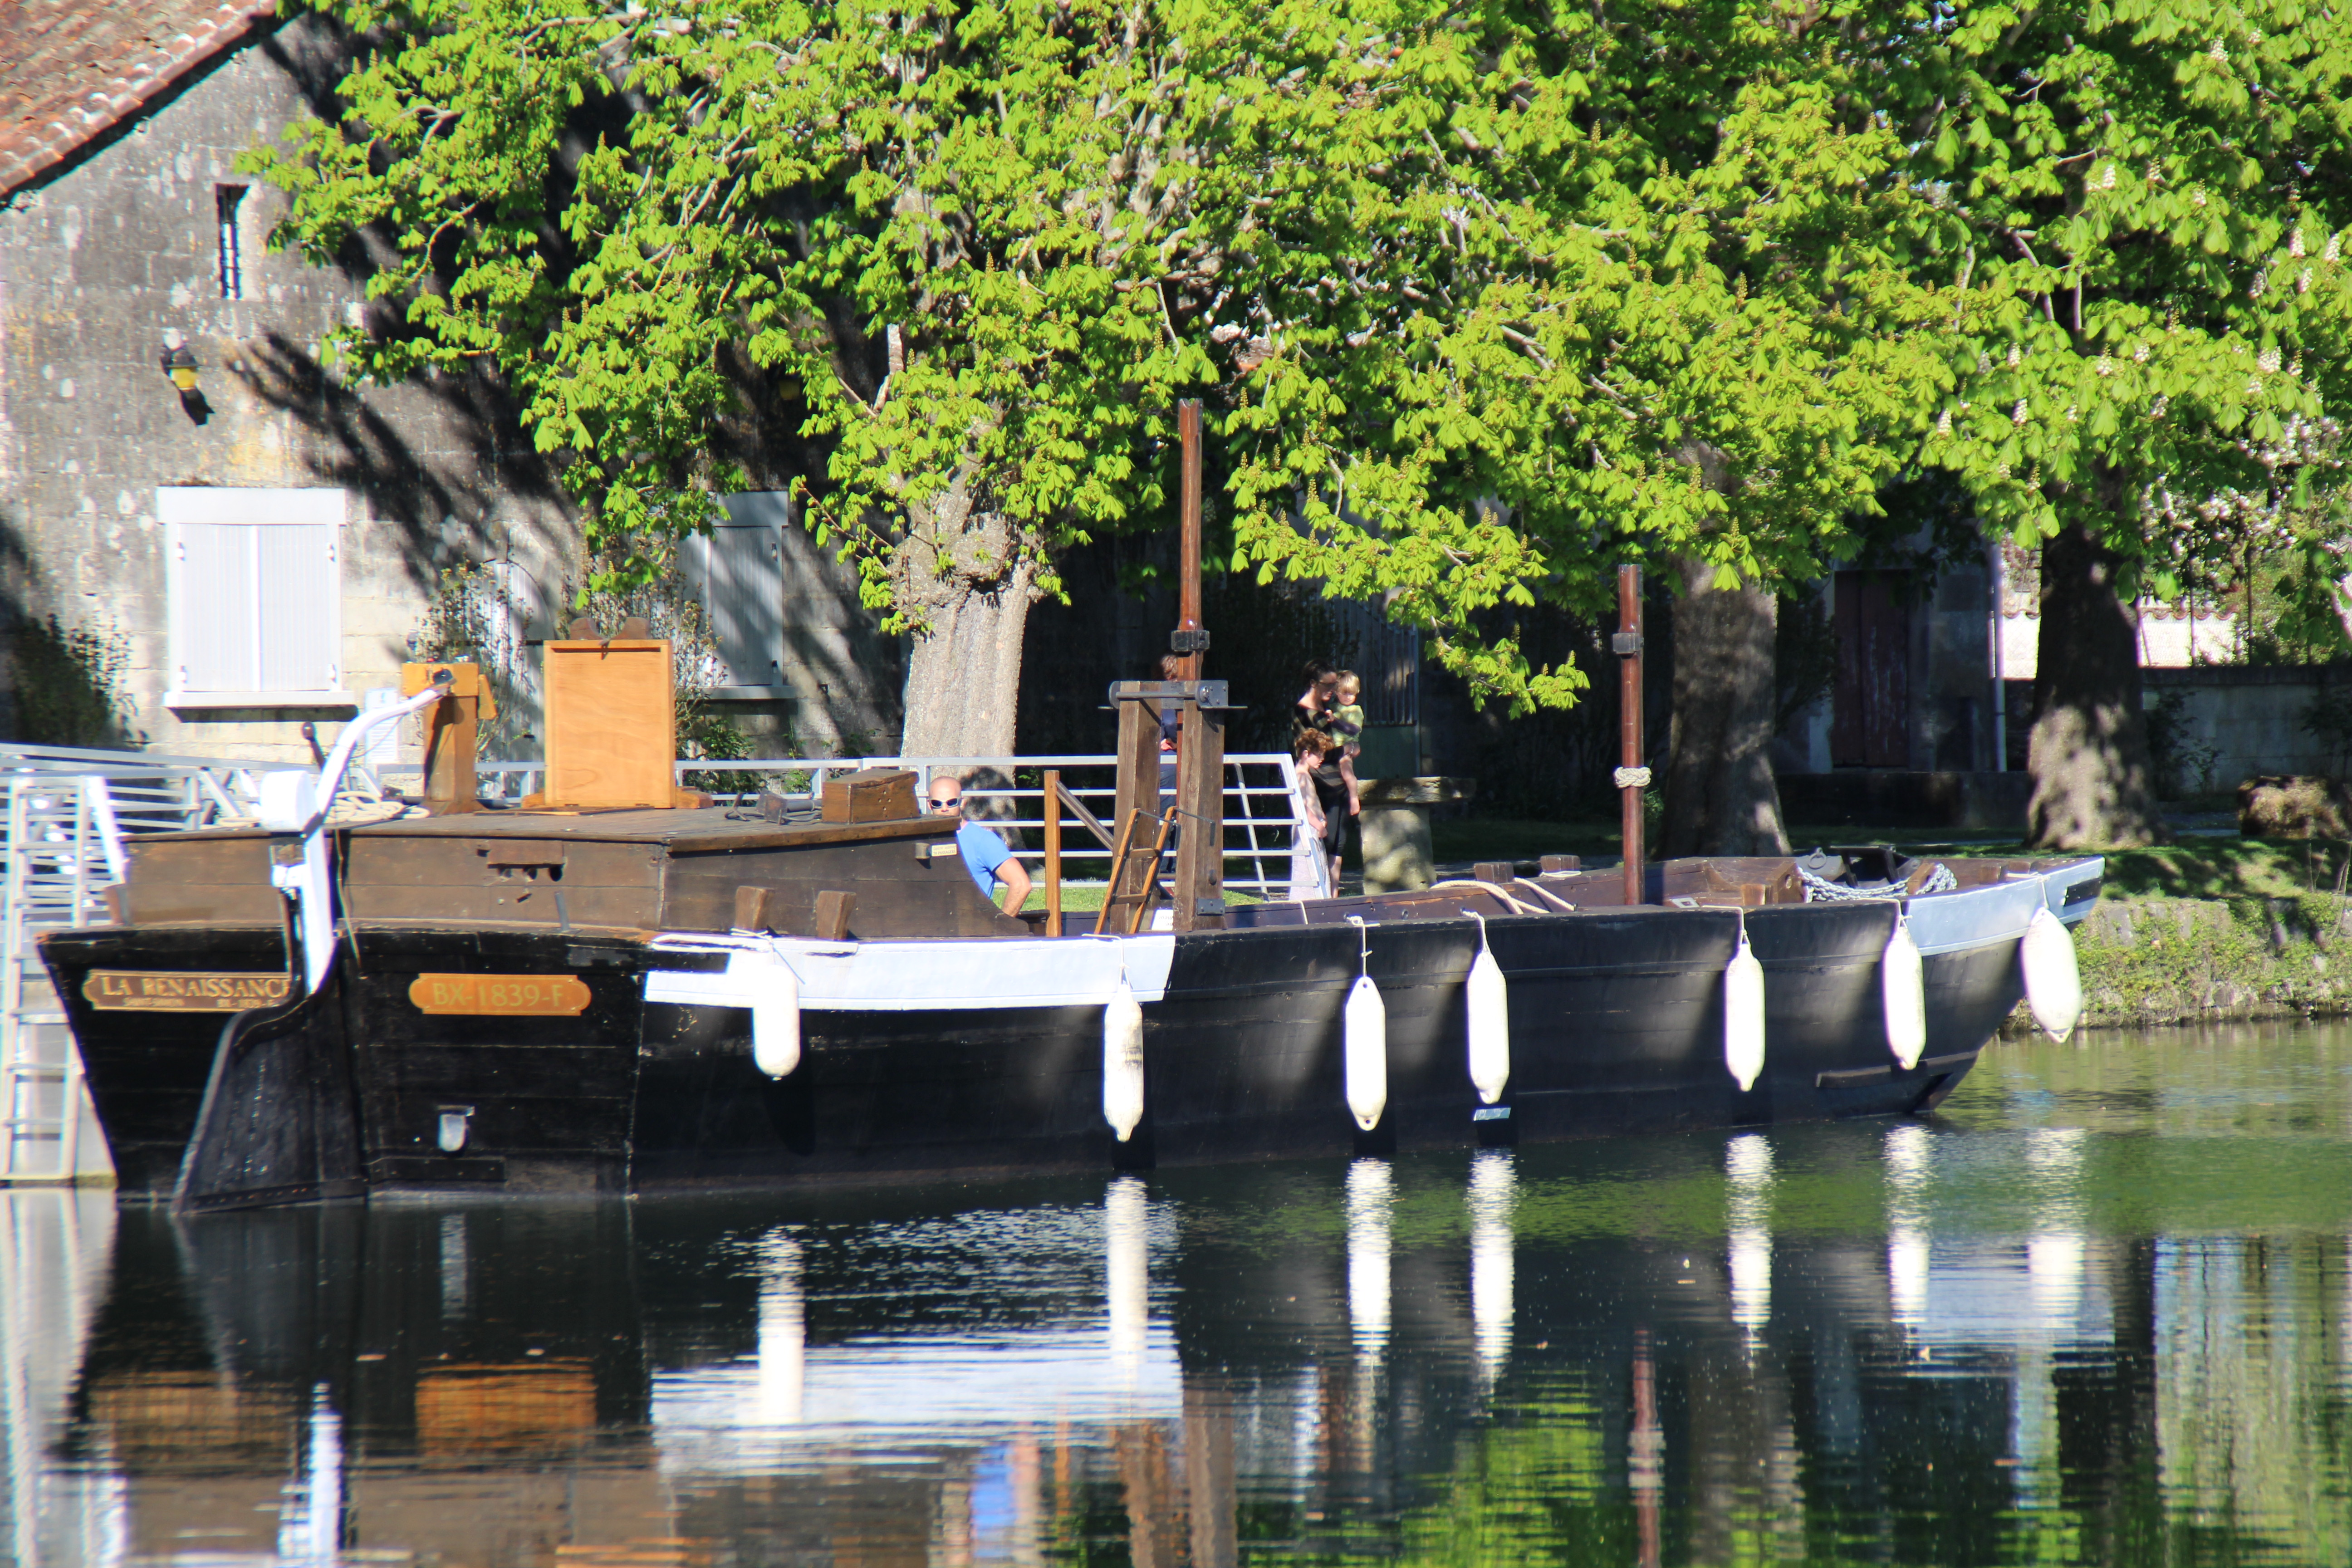 gabarre saint simon village gabarrier en bateau charente en croisiere inter croisieres sireuil nicols.JPG